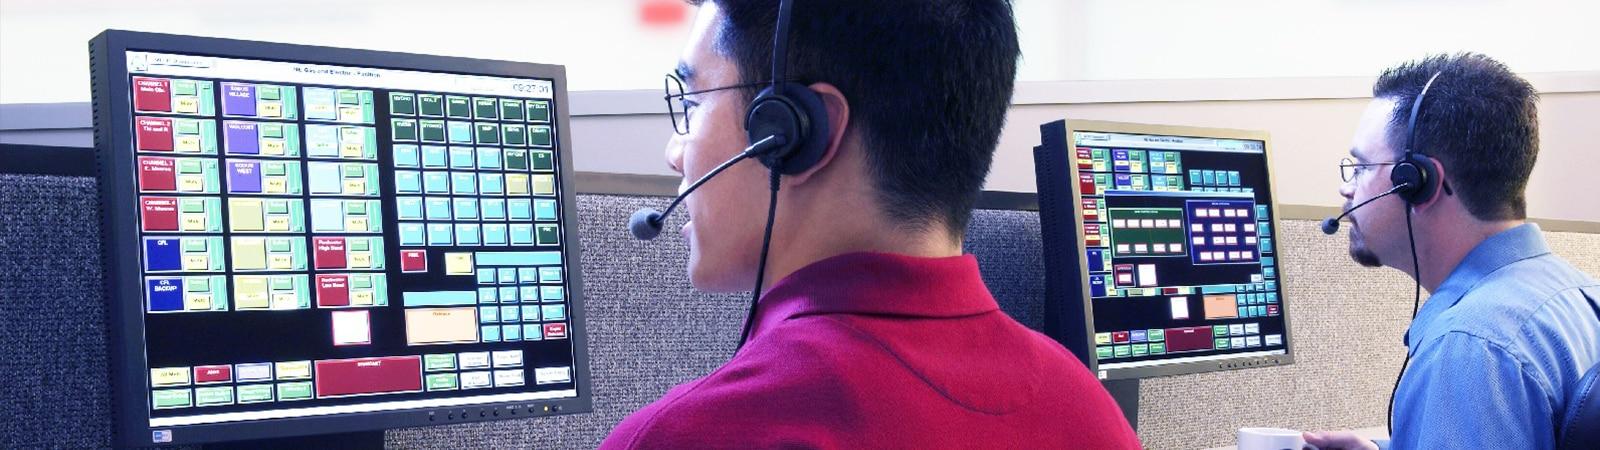 Customer service representatives handling enquiries